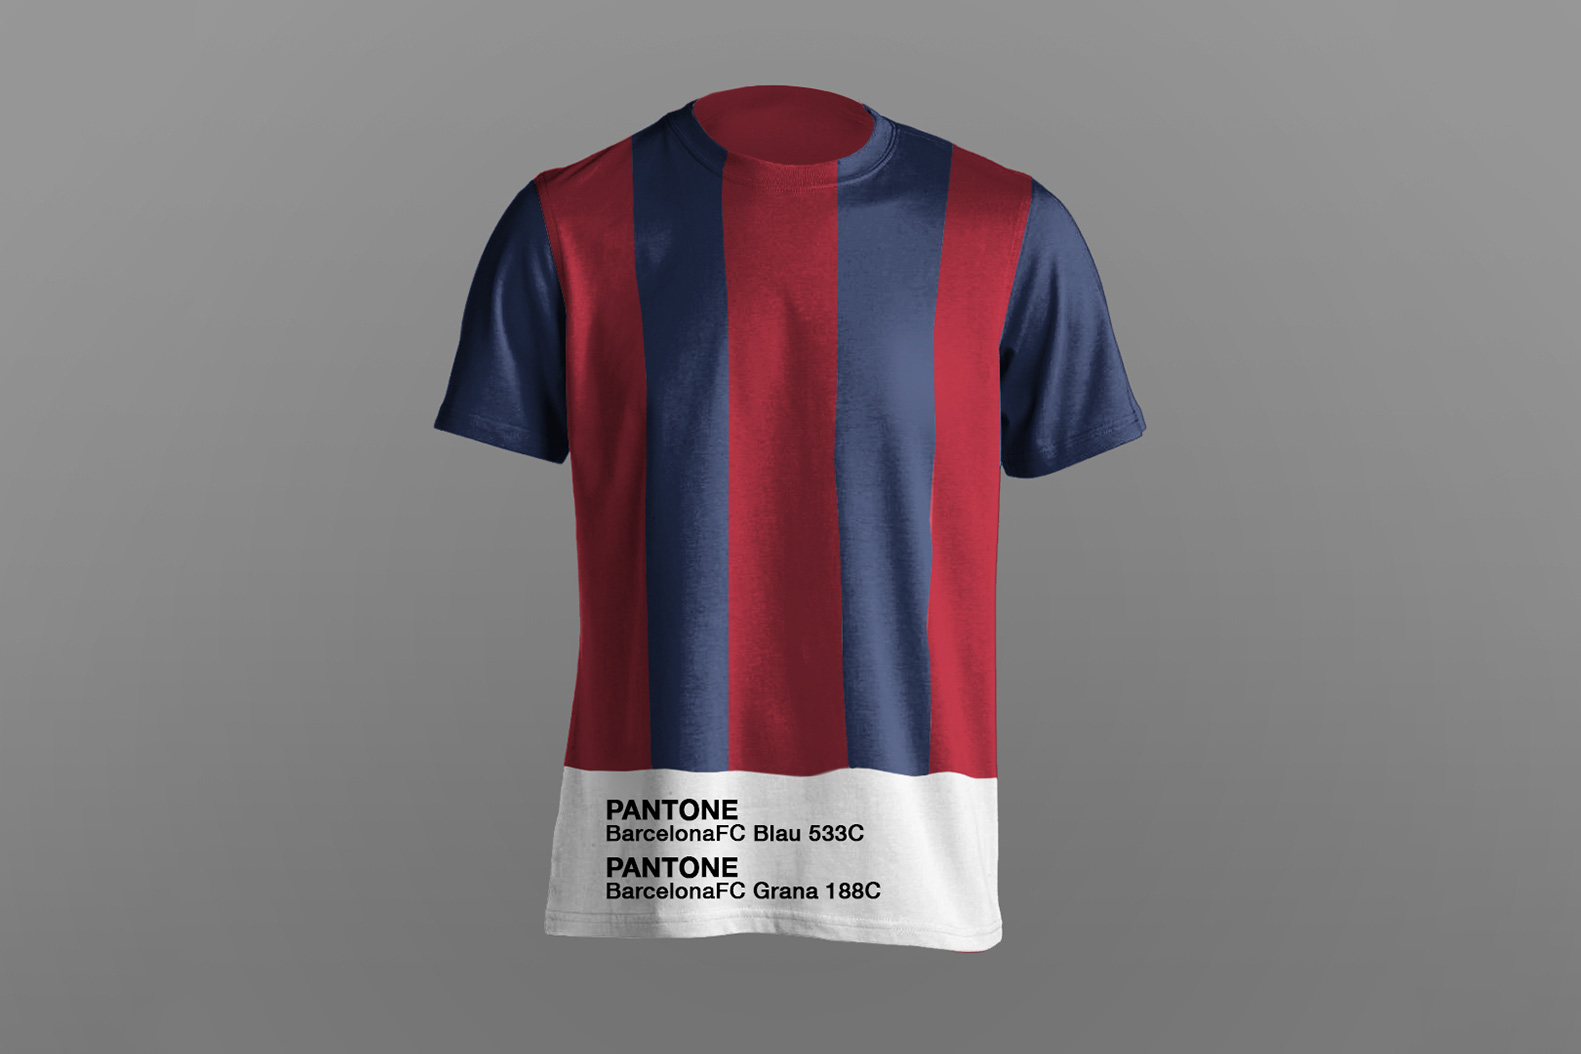 Paulo Oliveira Reimagines Iconic Soccer Jerseys With Pantone Sponsorship